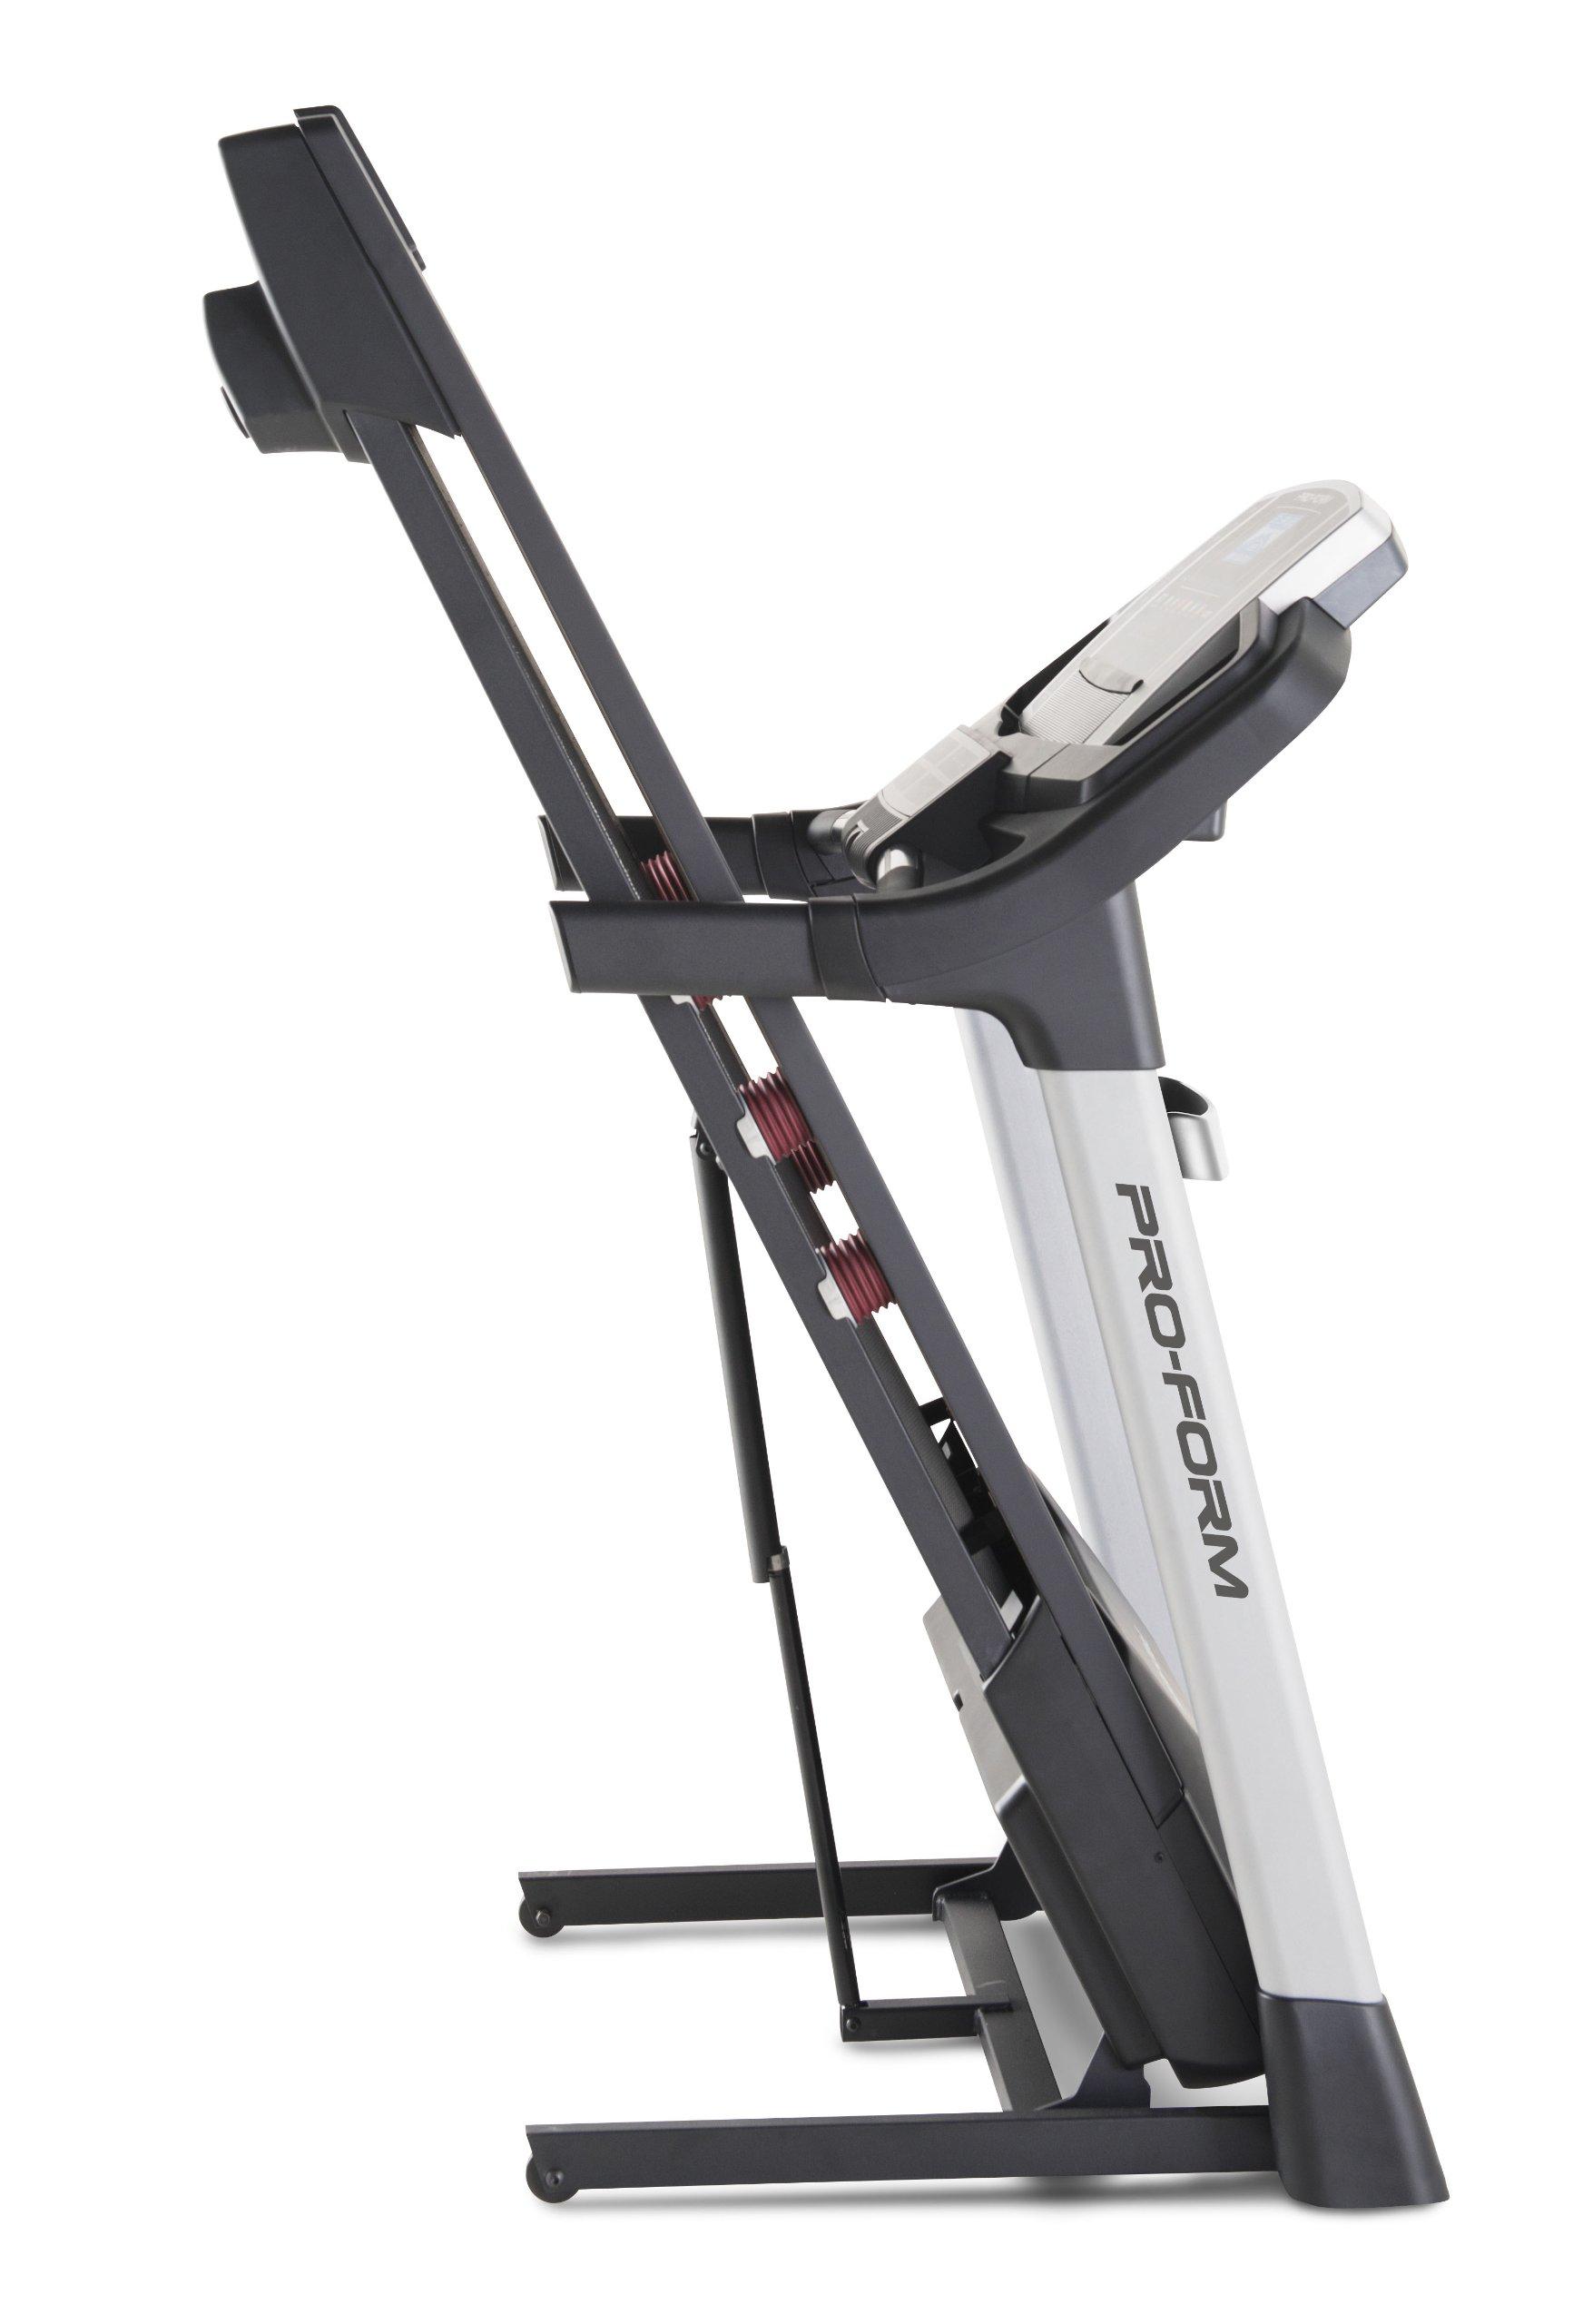 Proform Power 795 Treadmill Smart Monkey Fitness